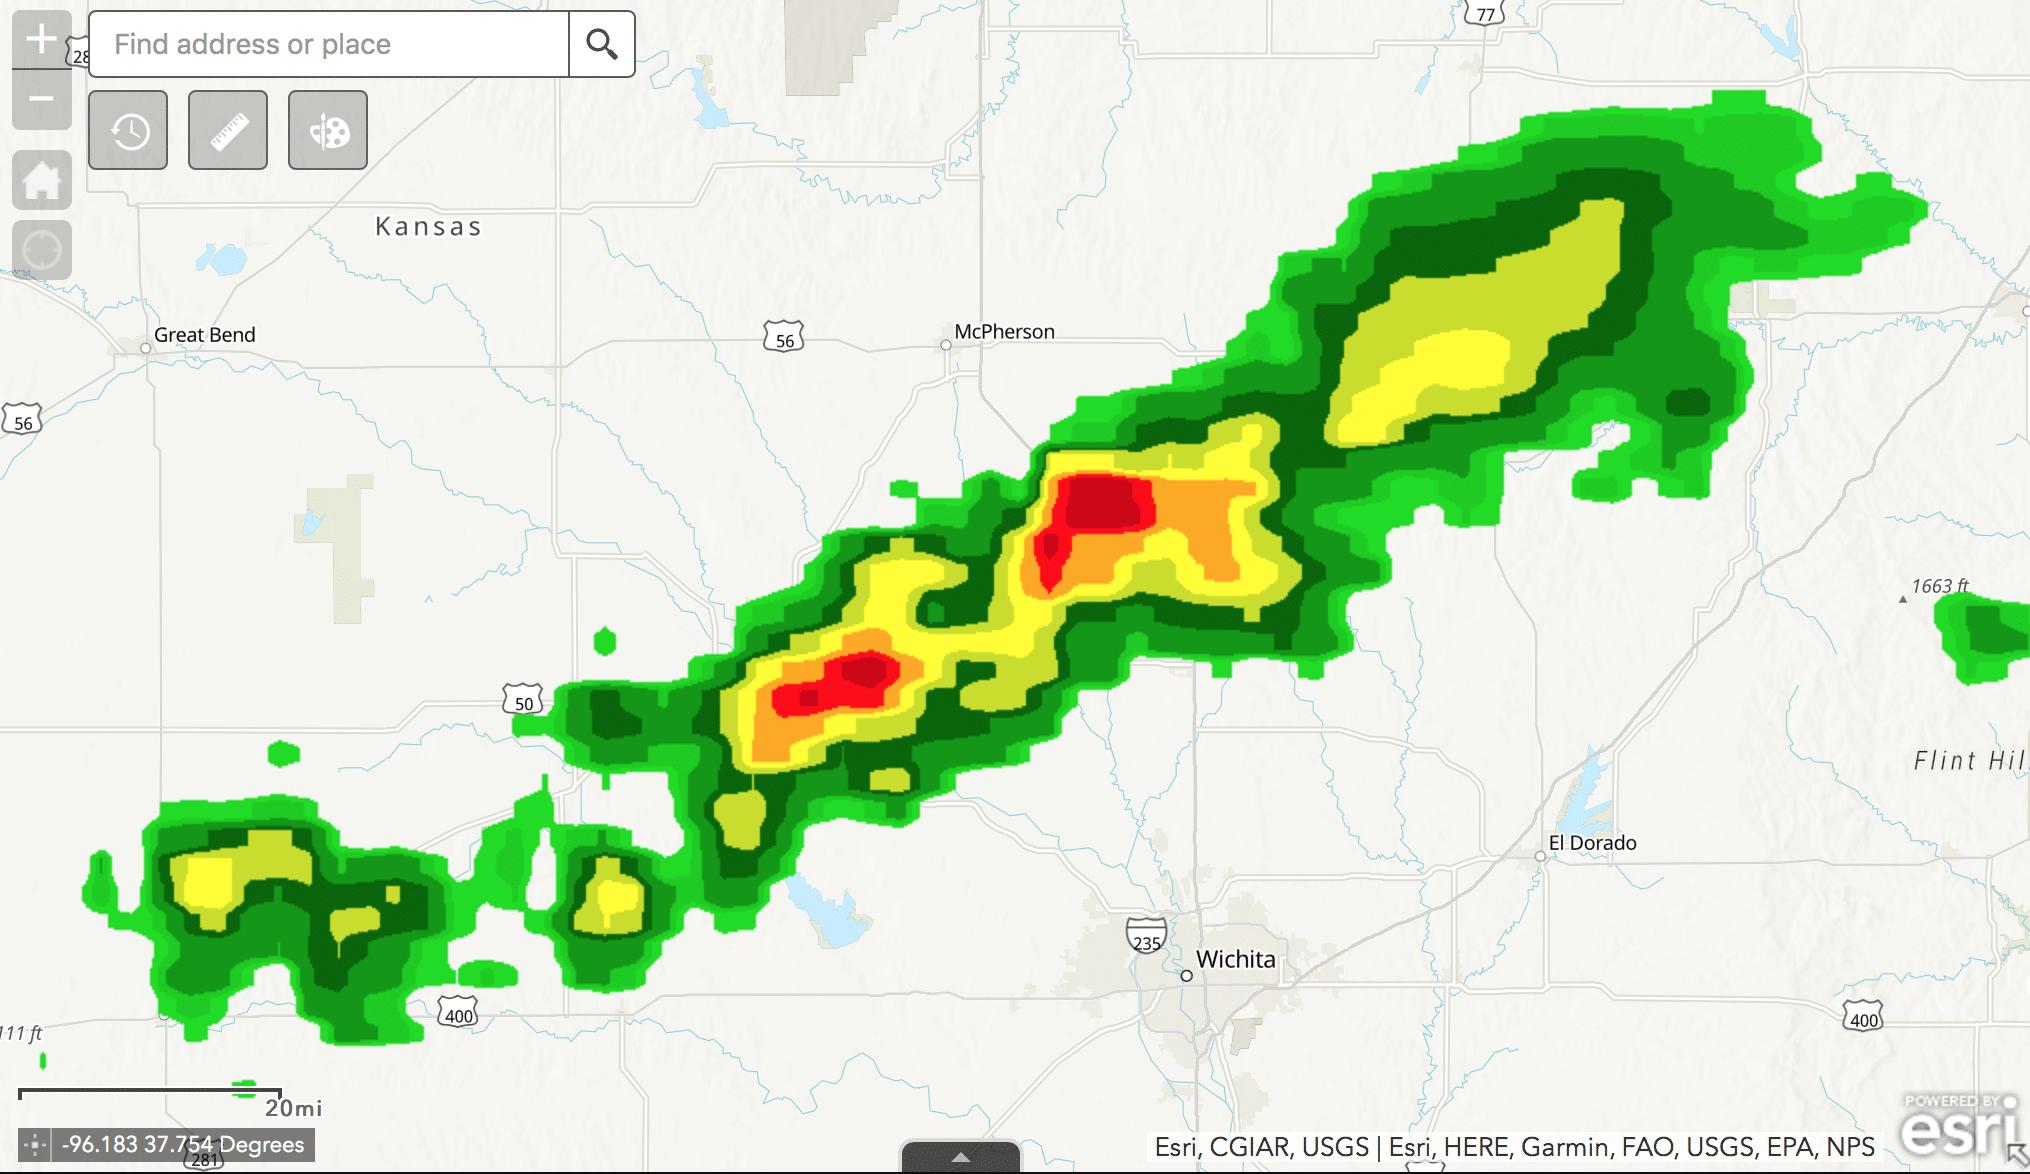 storm moving towards wichita future weather map